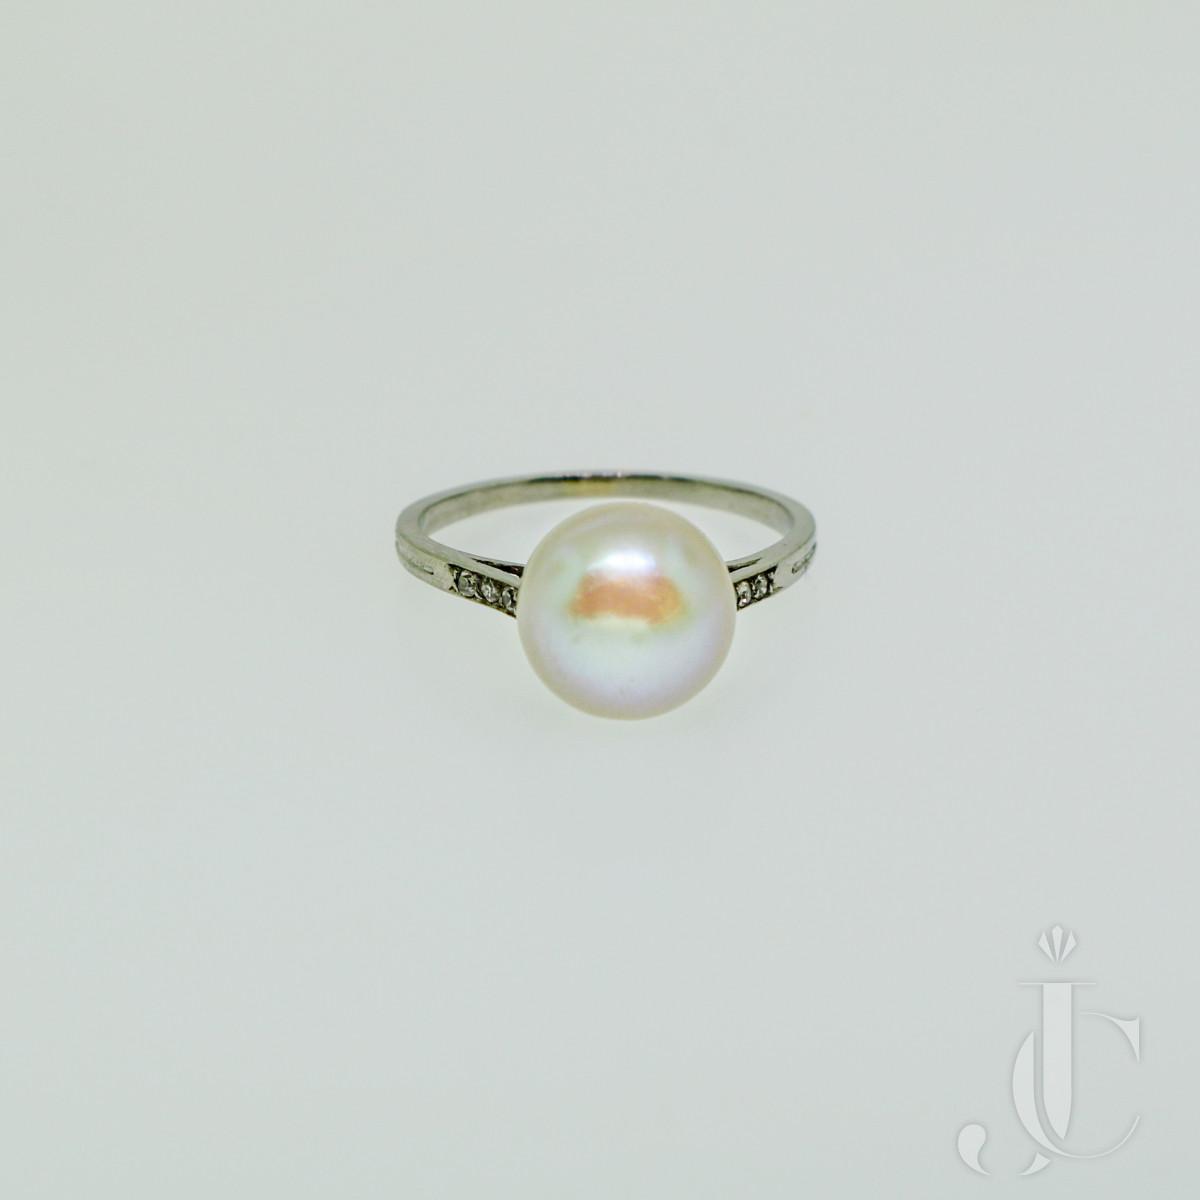 René Boivin Natural Pearl Ring